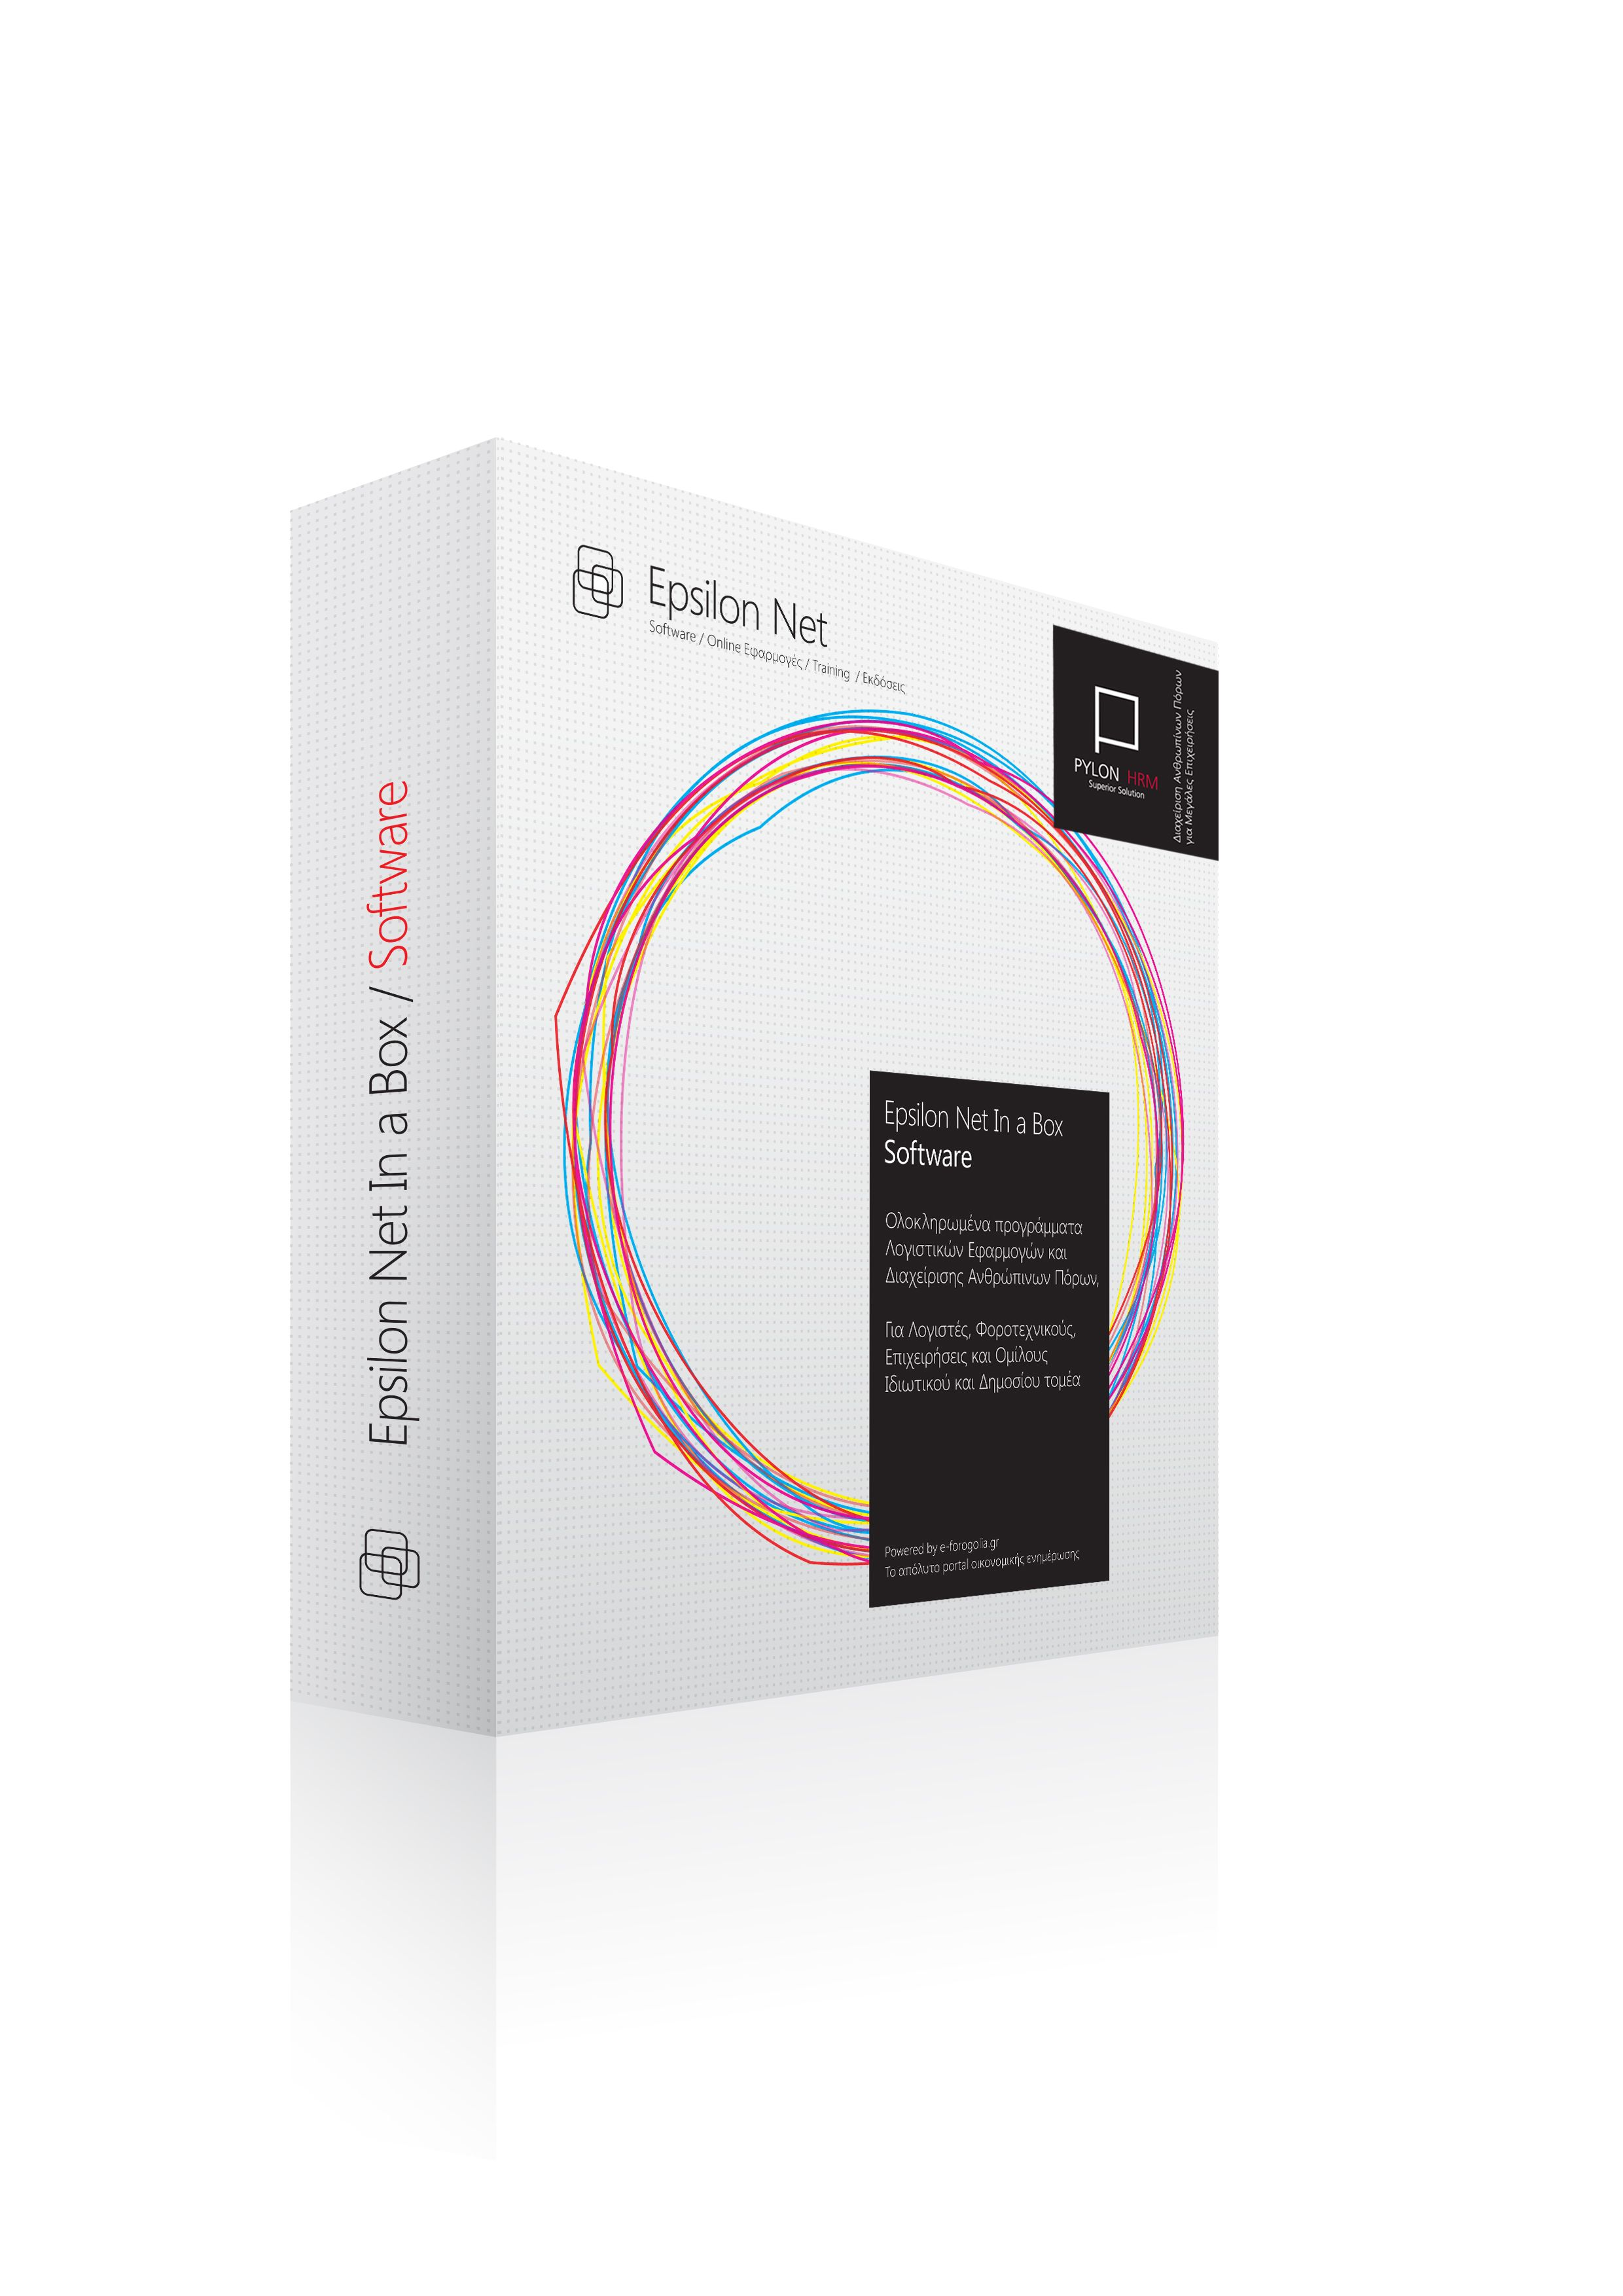 445+ Software Box Mockup Online Zip File